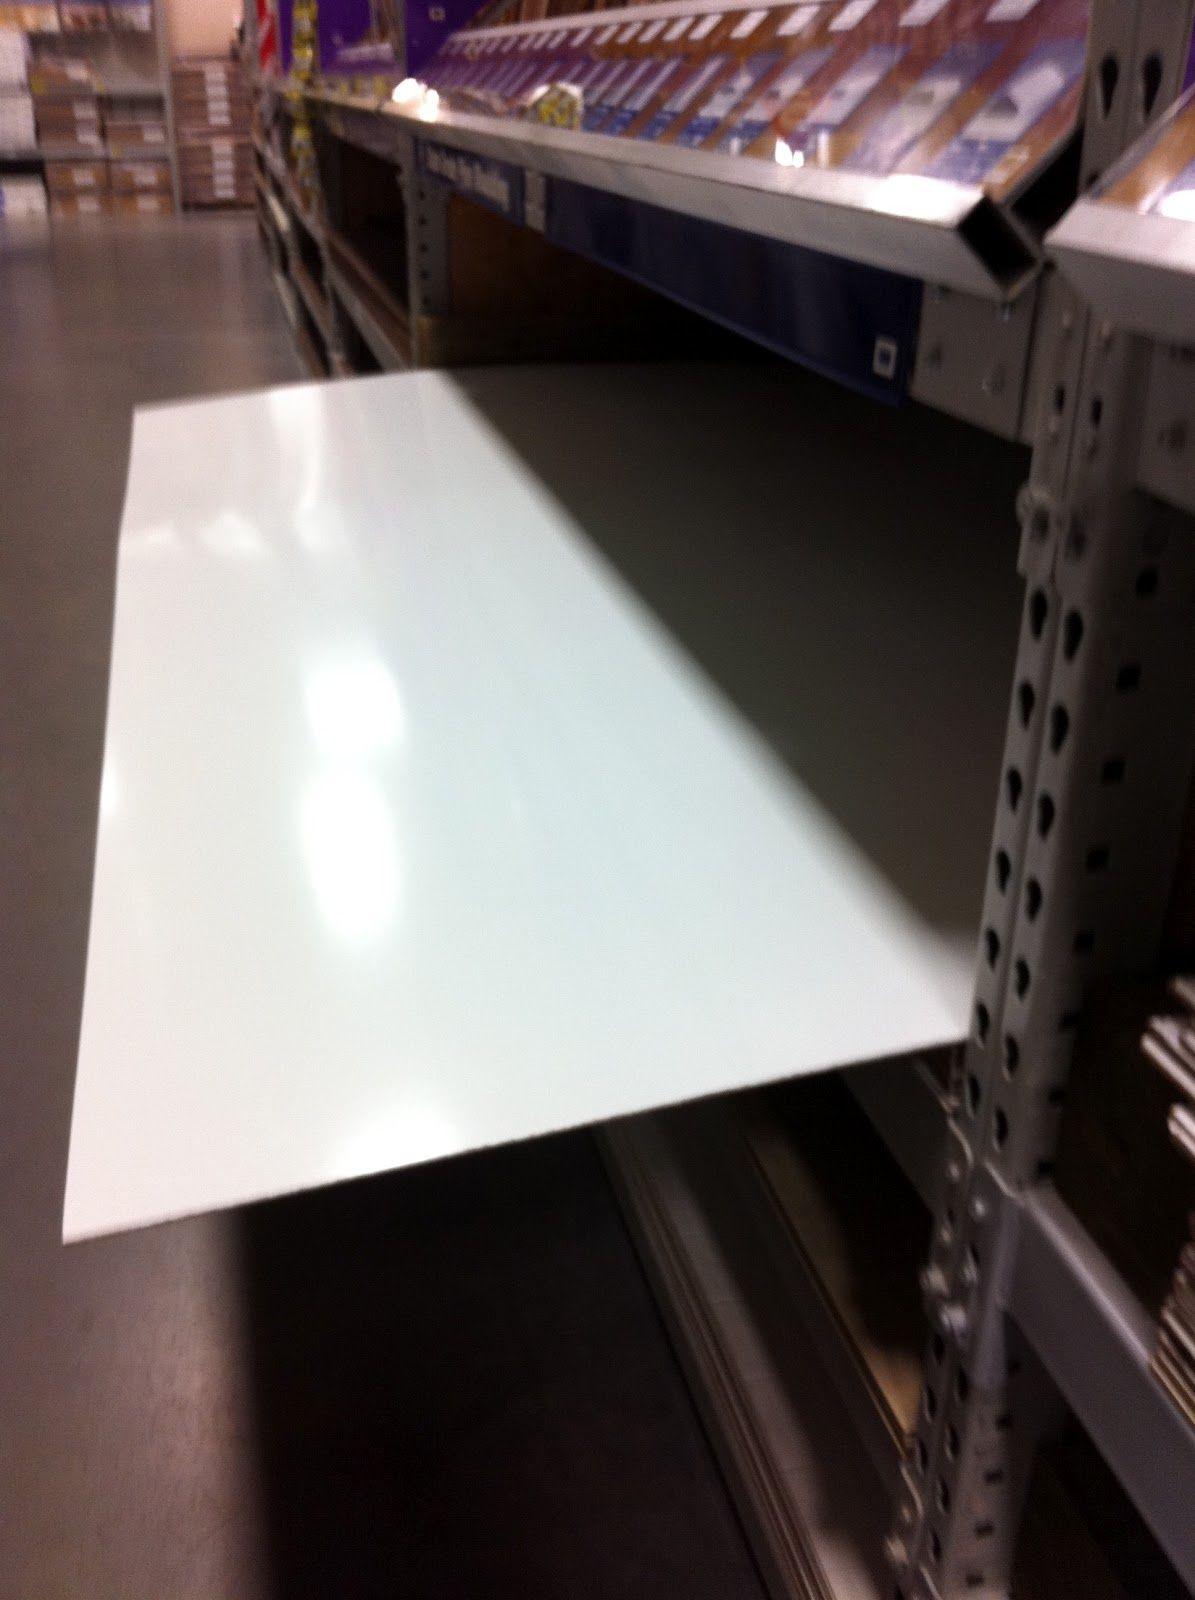 Diy White Boards So Cheap Diy Classroom White Board Diy Whiteboard